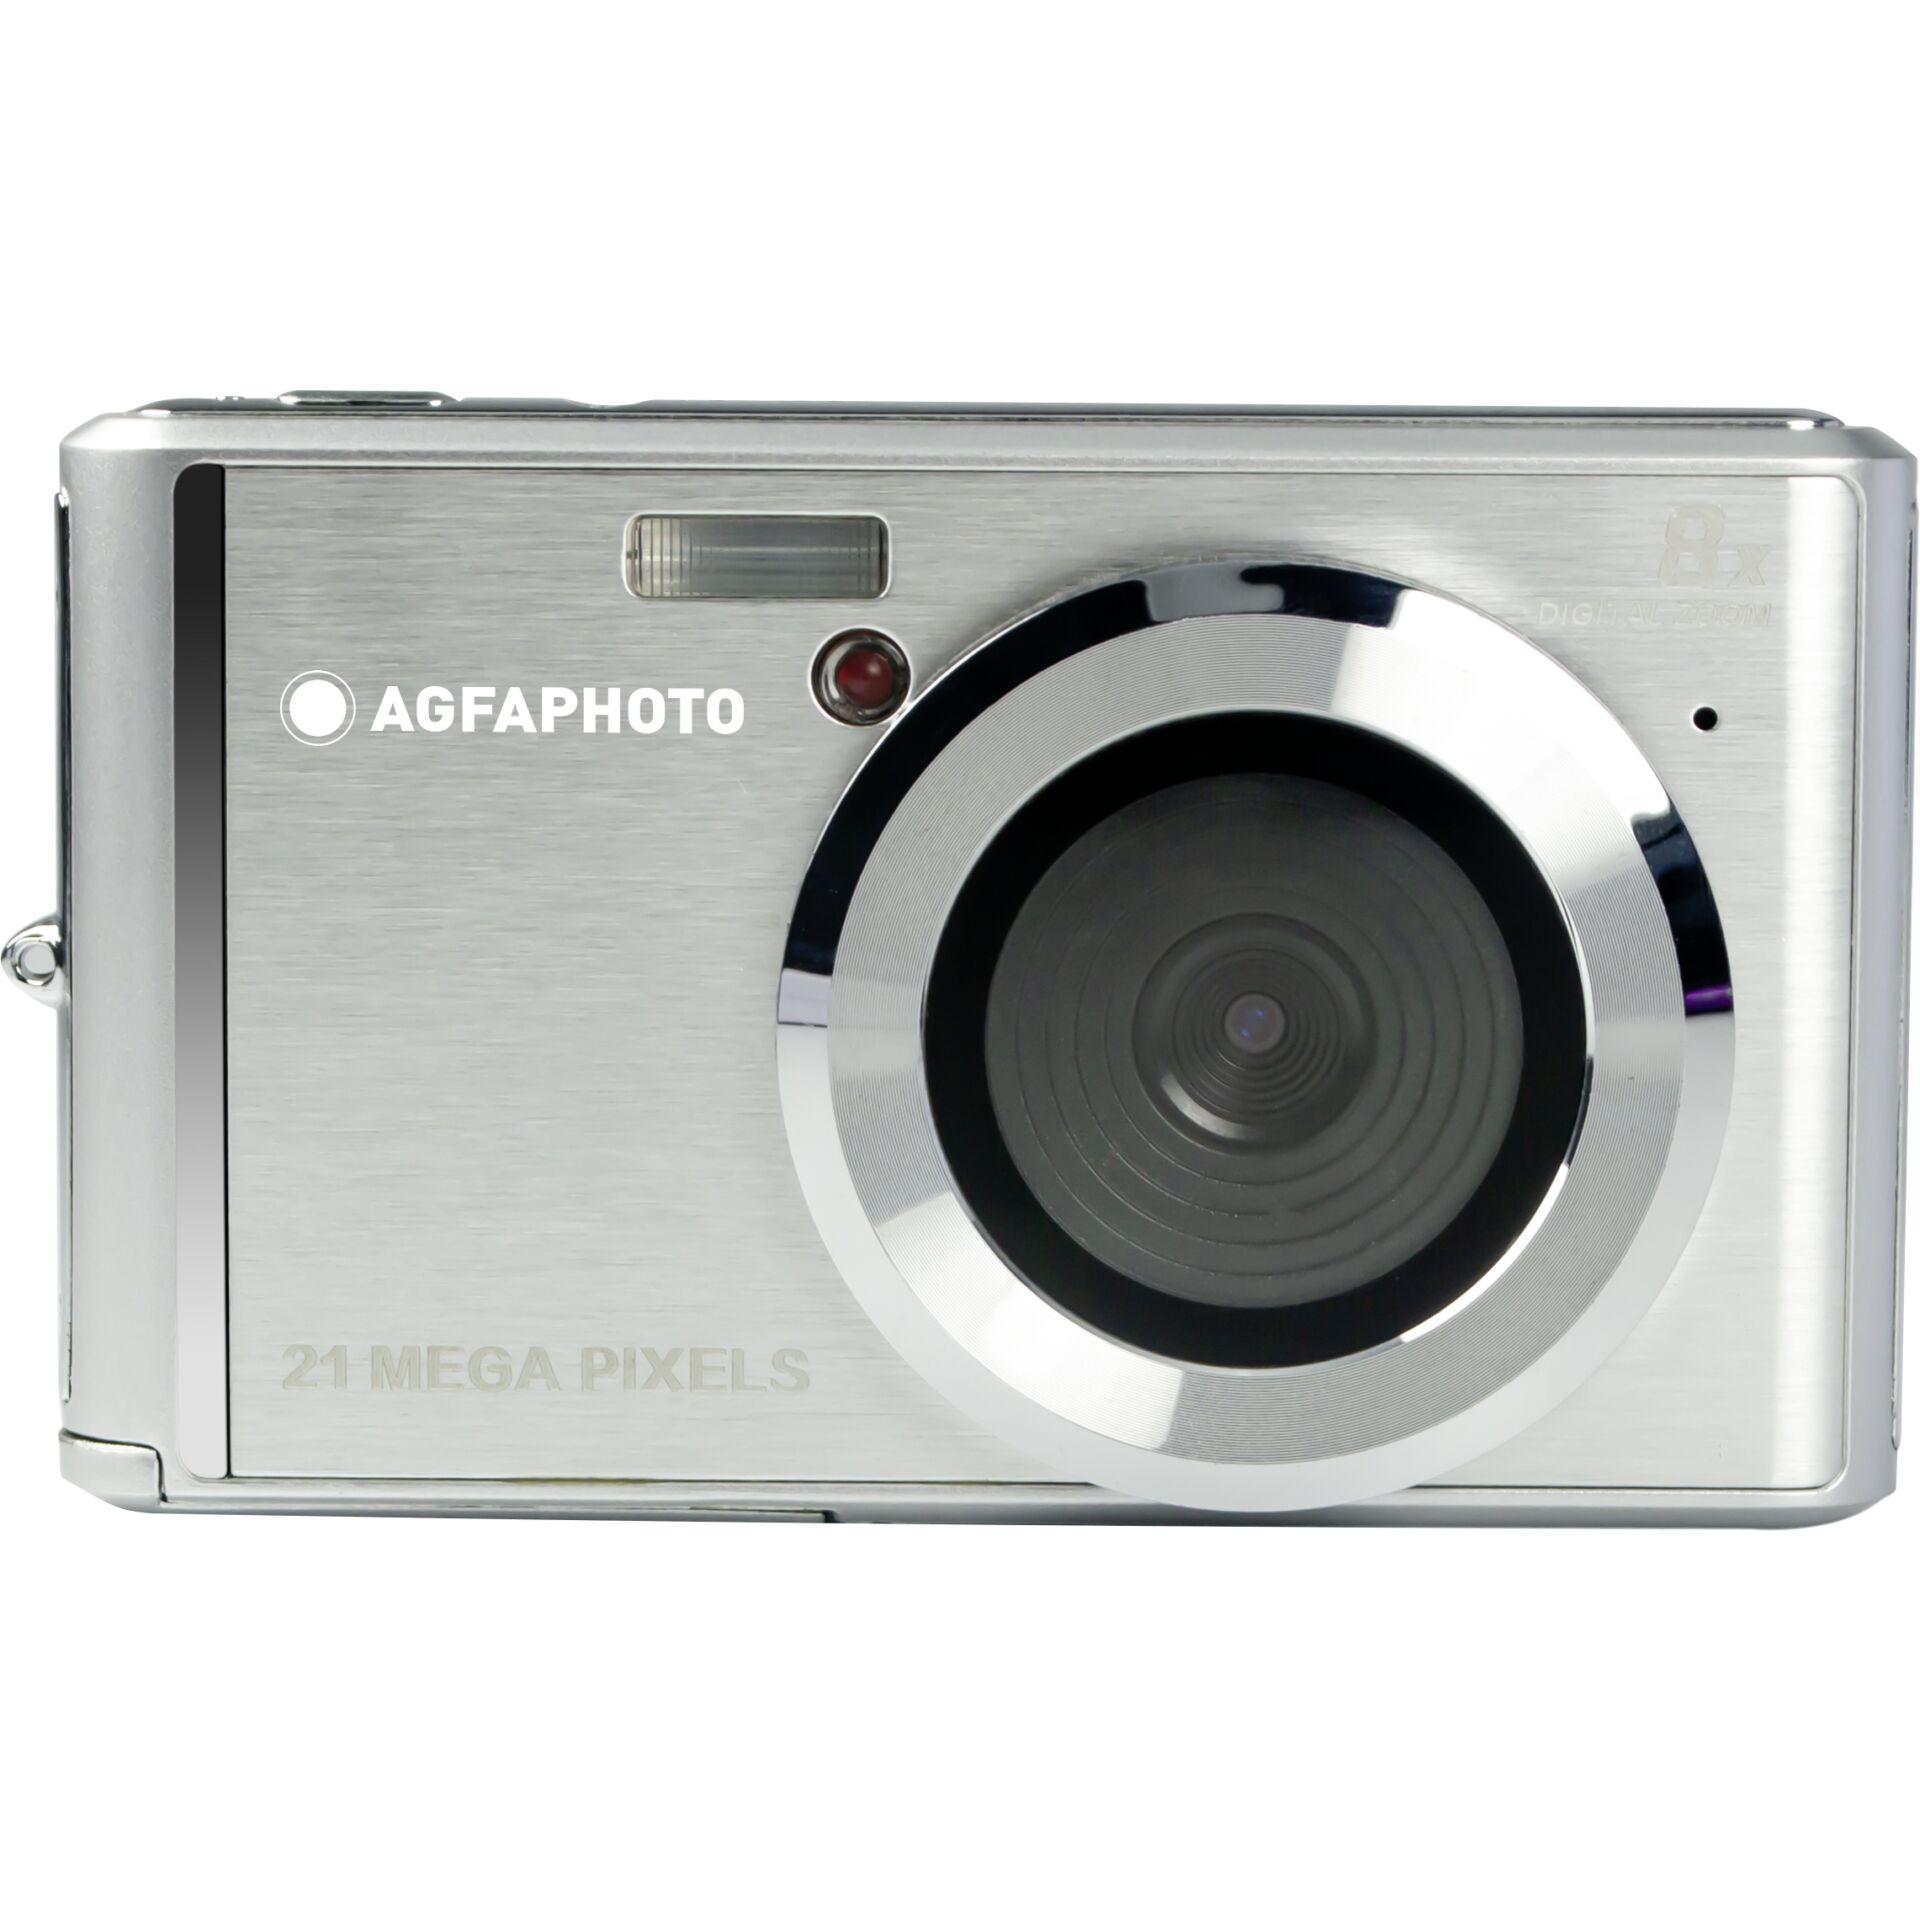 Agfa Compact Camera DC5200 silver